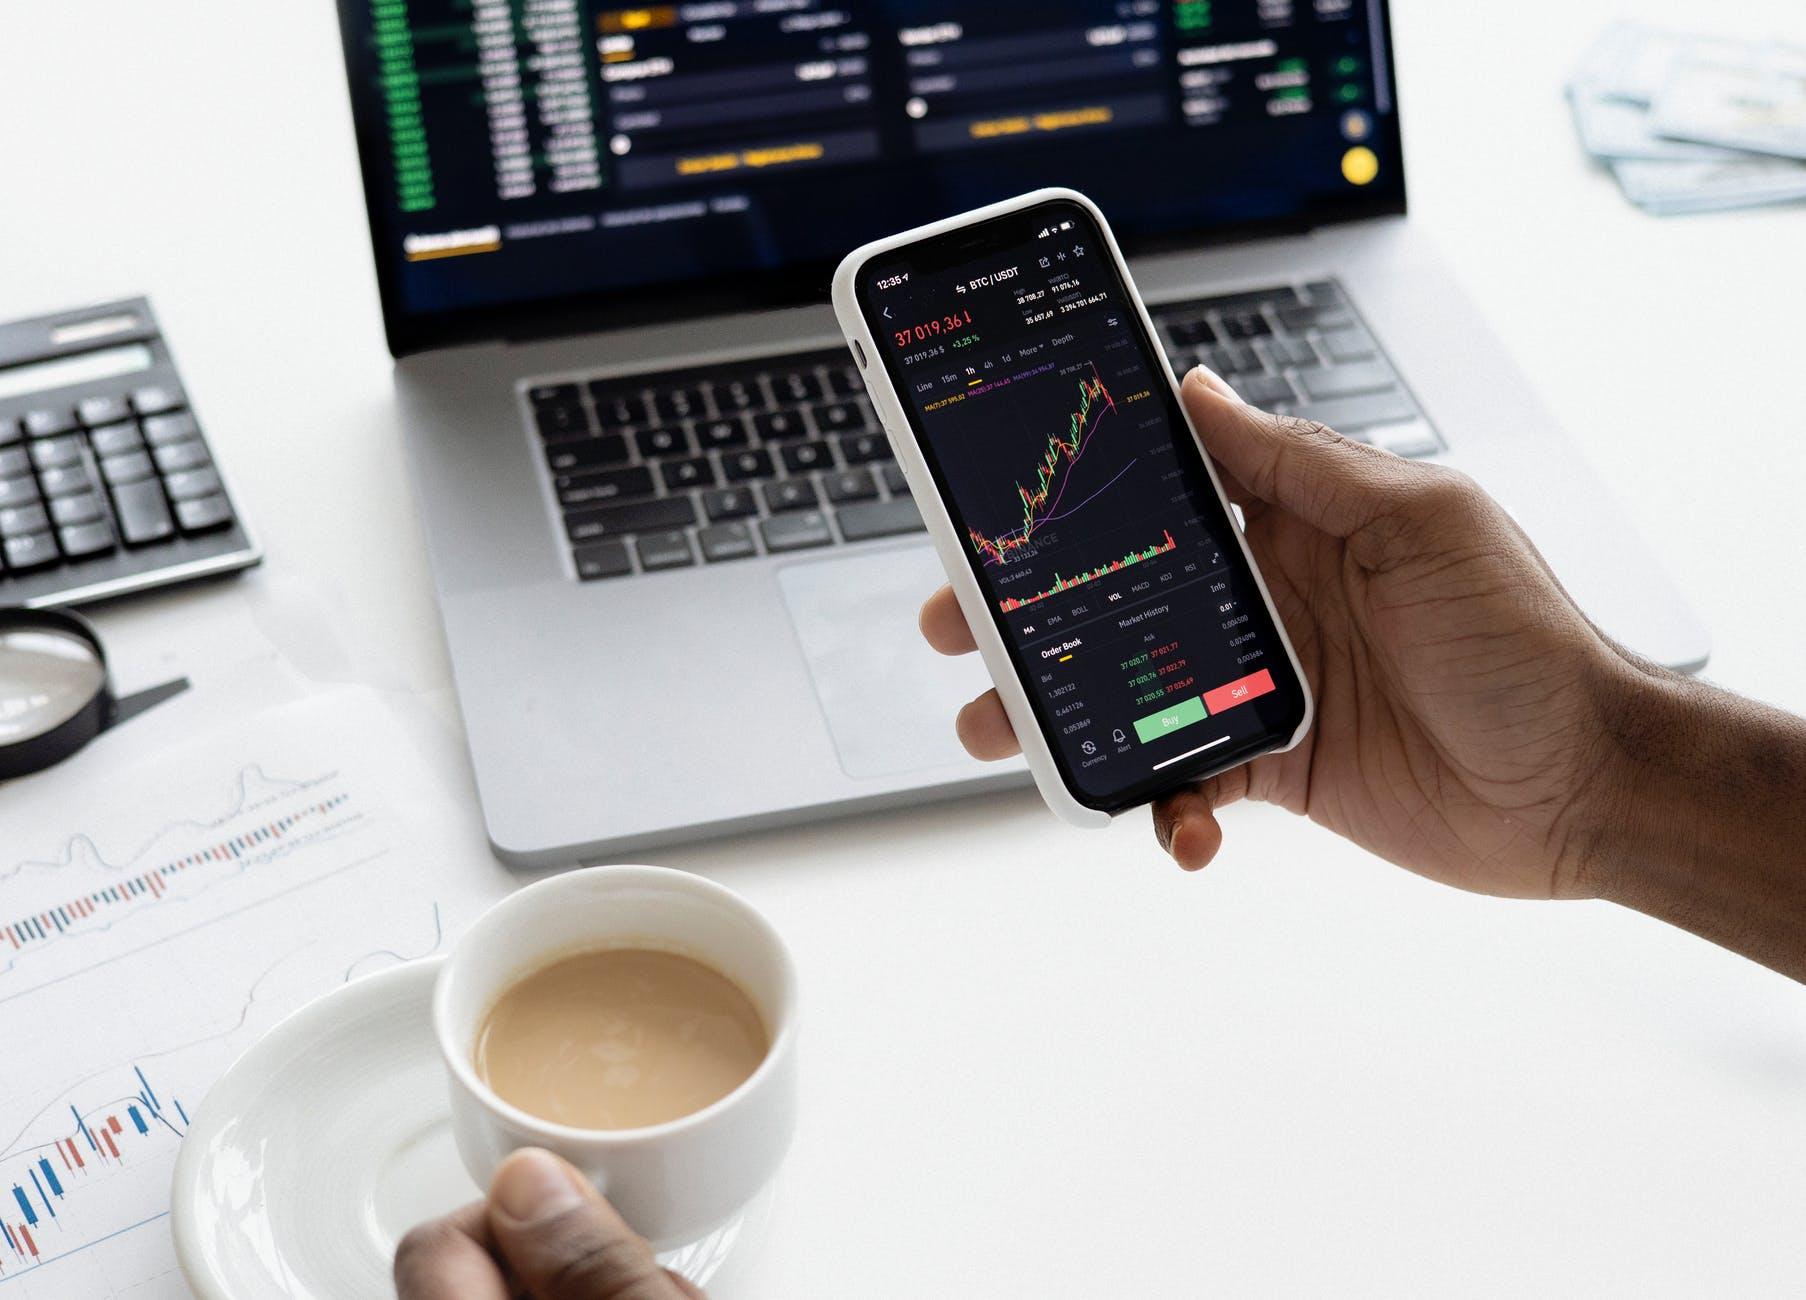 Sharekhan Says To Buy The Stocks Of This Finance, Pharma and IT Companies